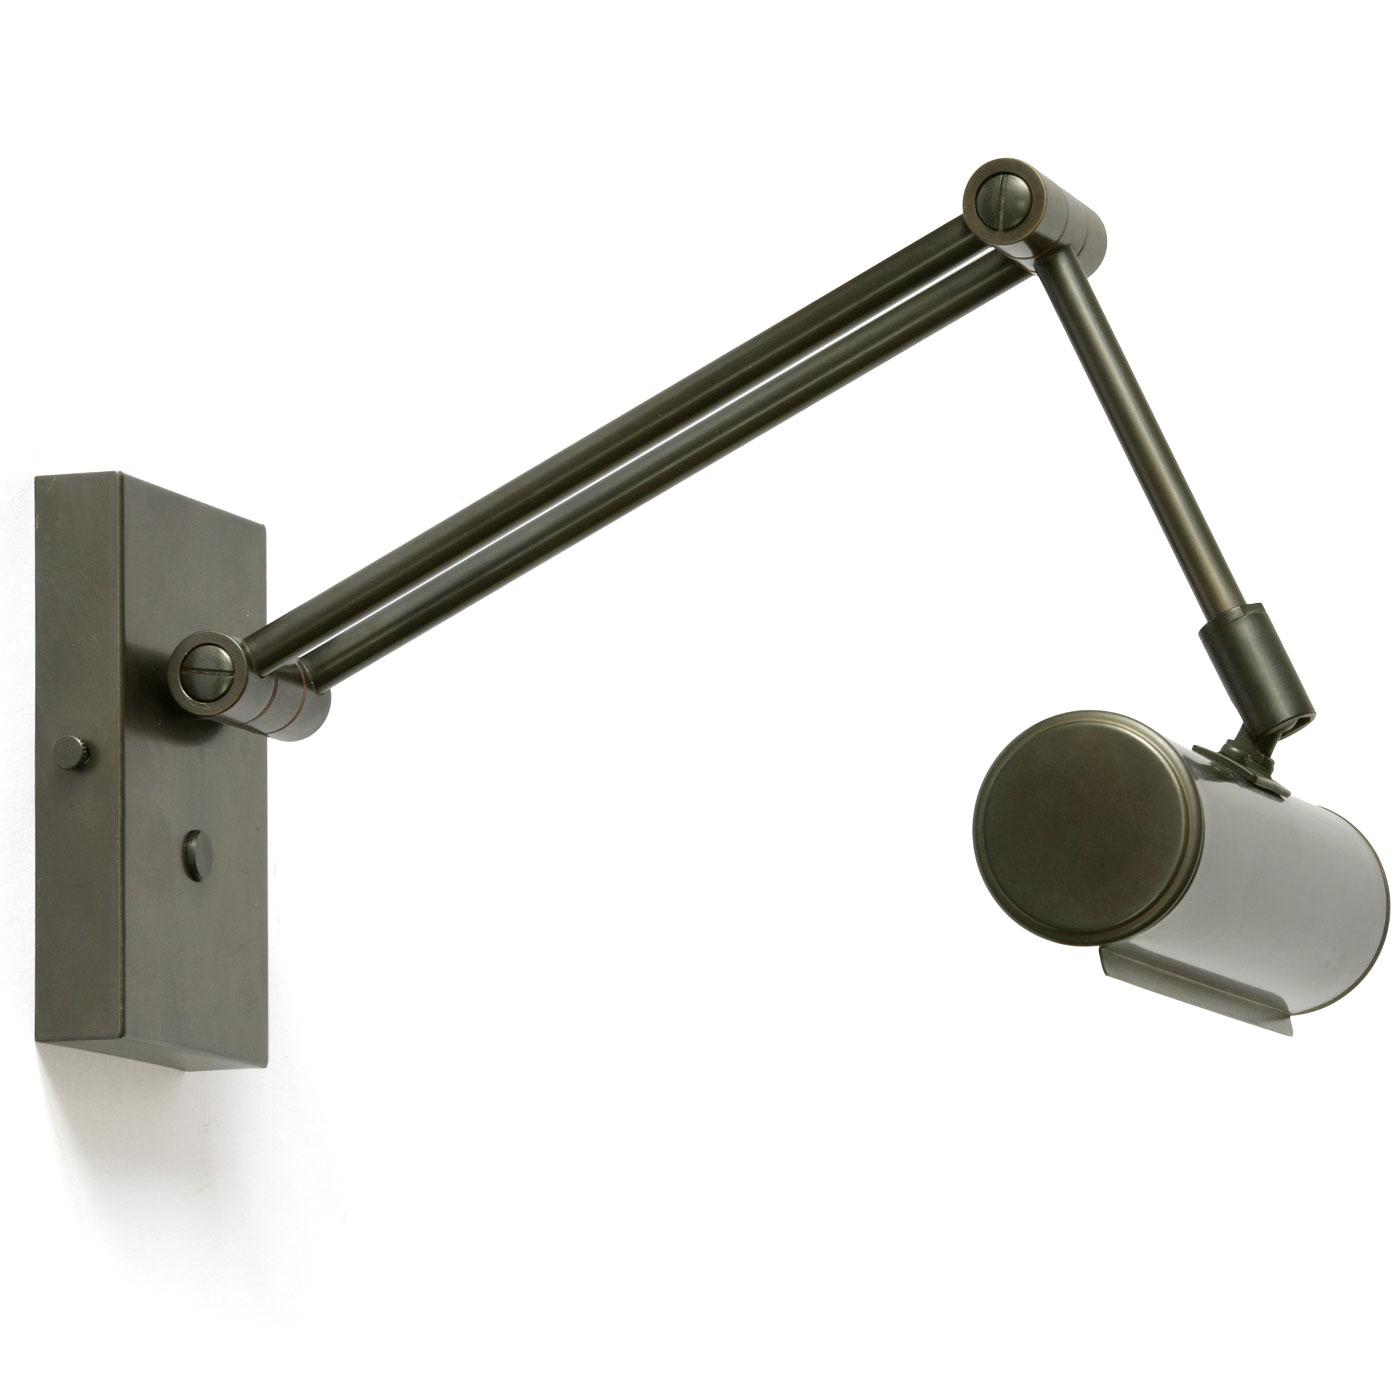 30cm Gelenk Bilderleuchte Vintage Wandleuchter Messing Bilderlampe Wandlampe